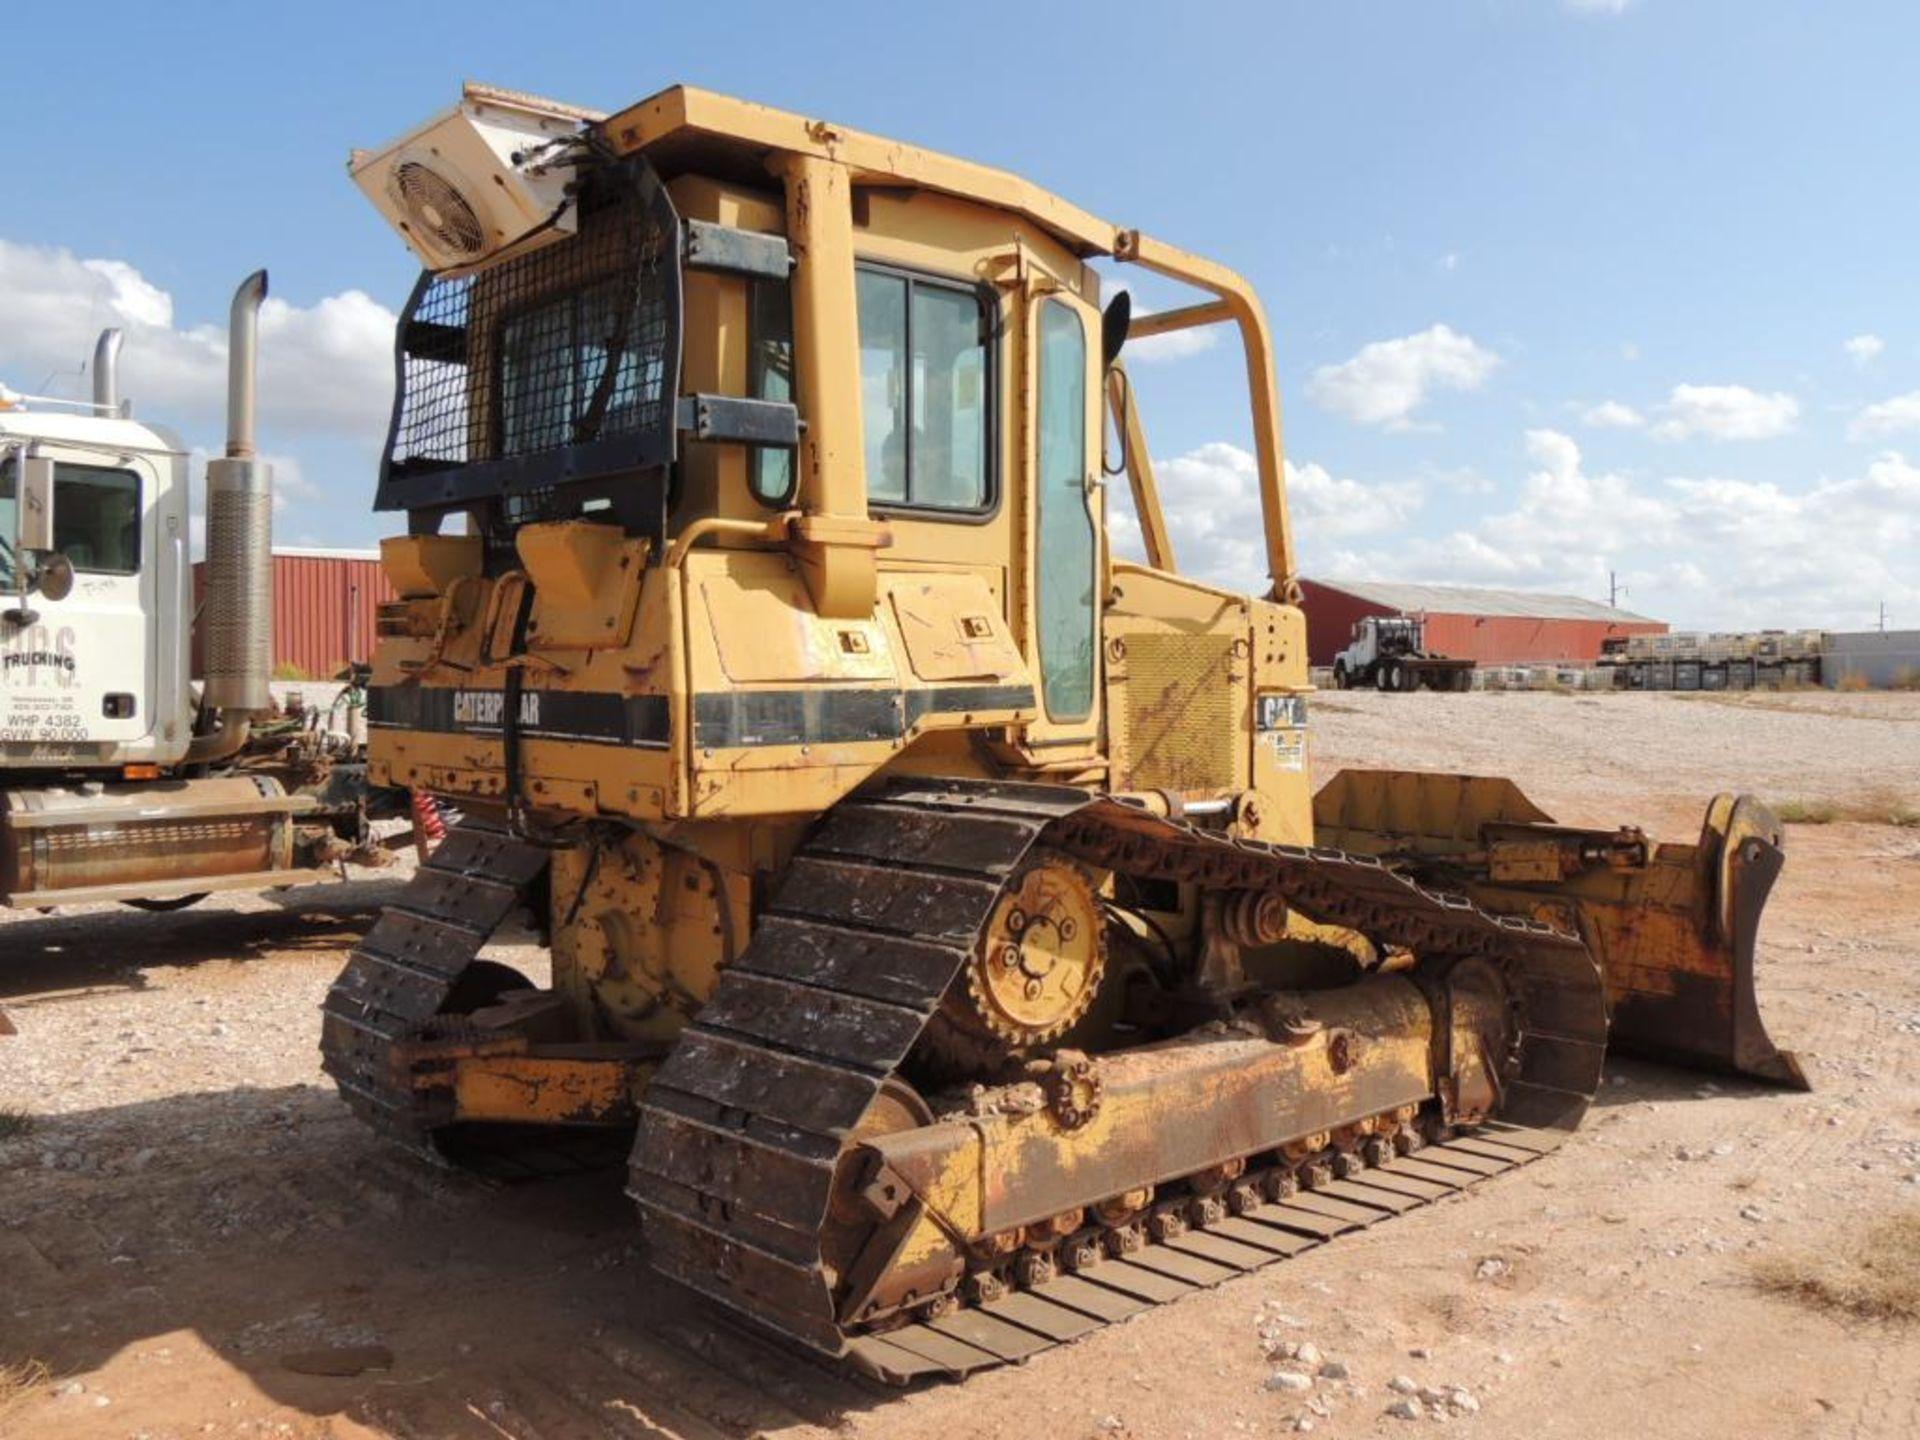 1996 Caterpillar D4H-LGP Series III Crawler Tractor, 6 Way Blade, 30 In. Grousers, 7570 Hrs. - Image 3 of 4